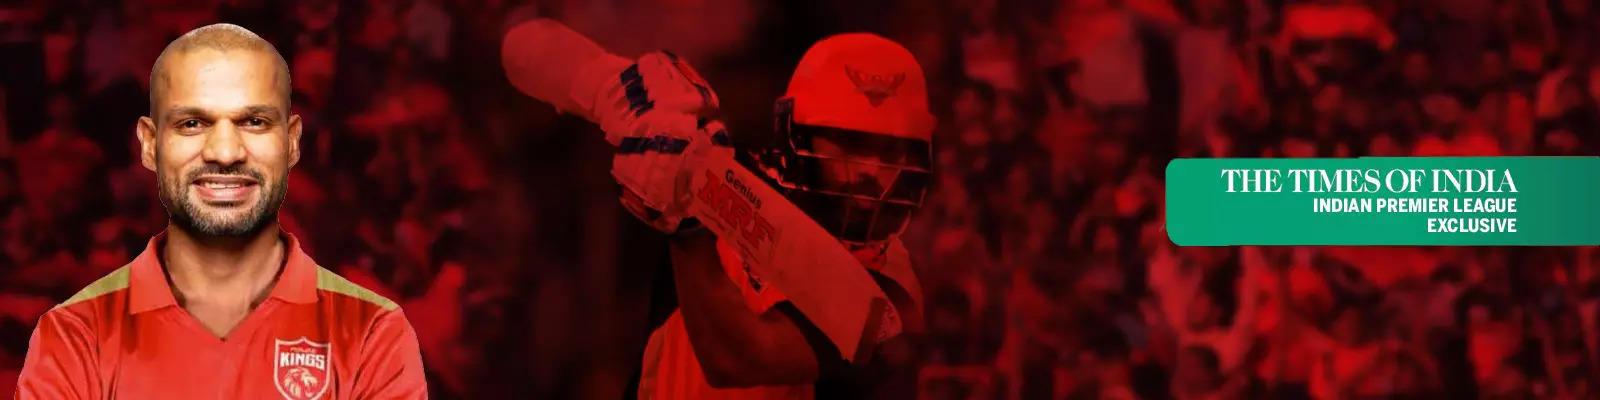 Batsman with maximum fours in IPL History